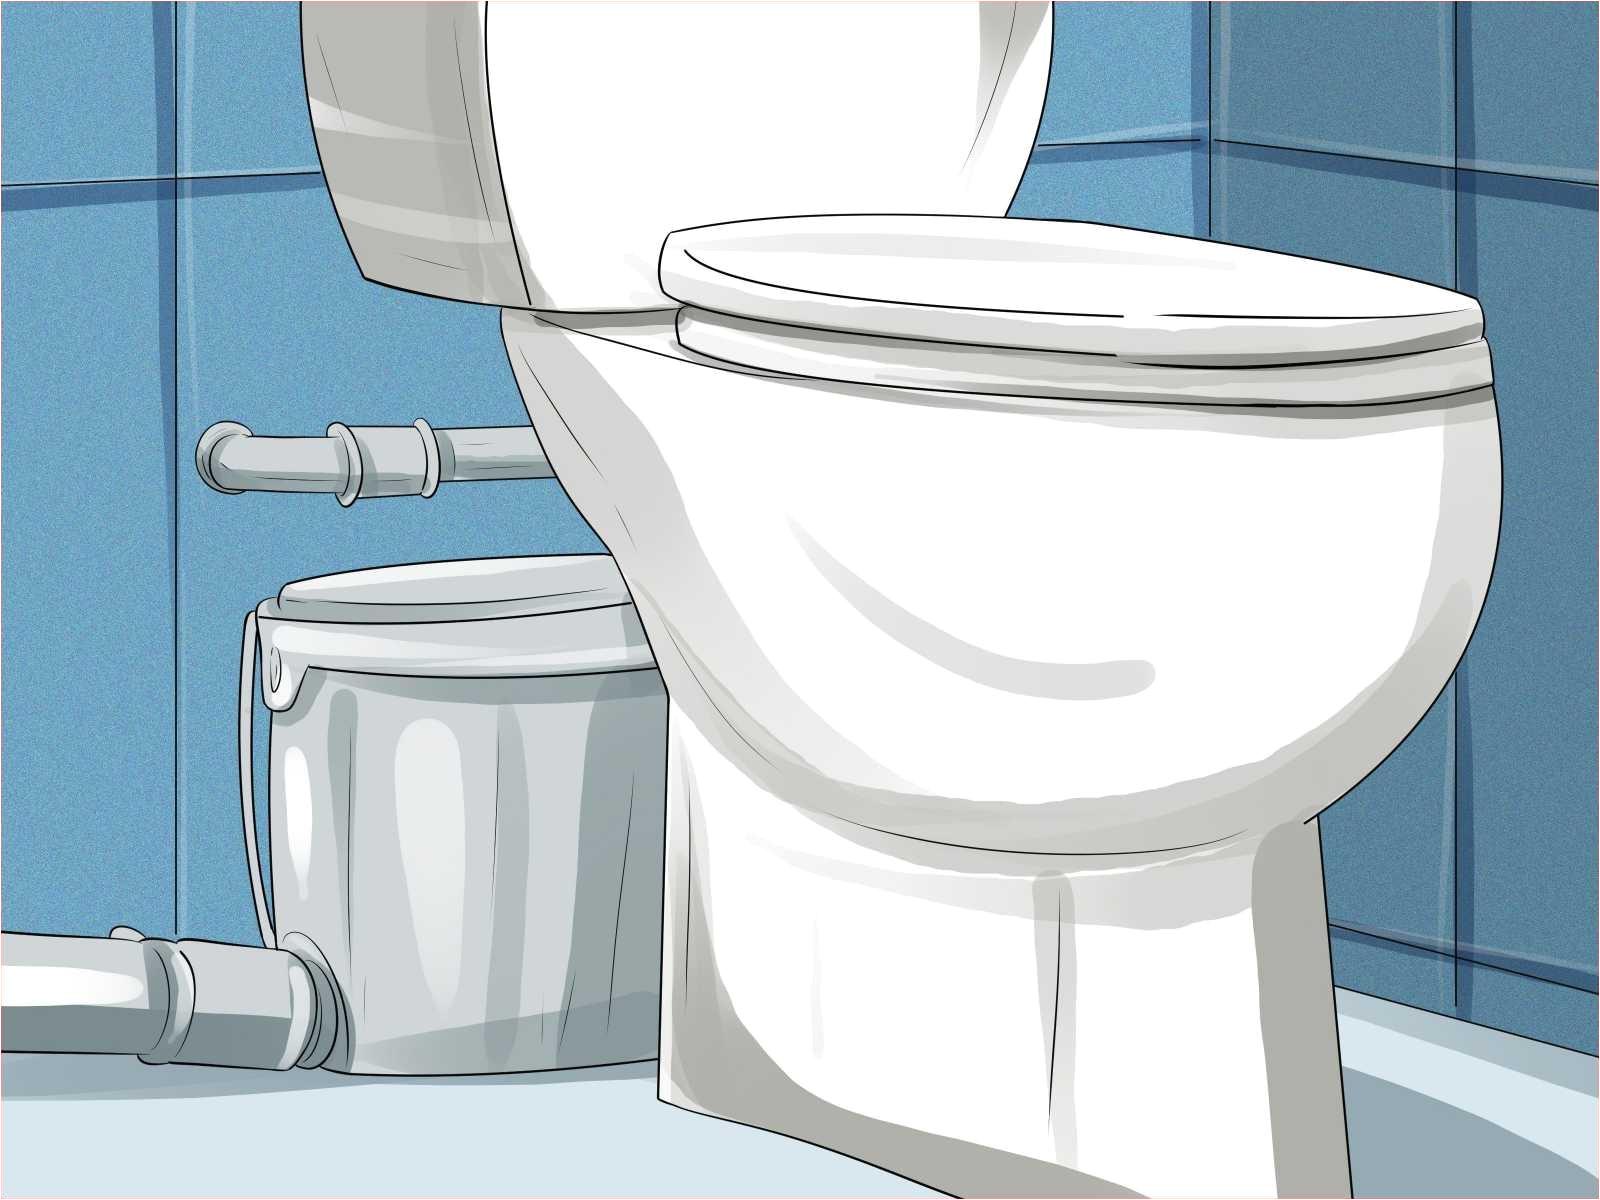 Portable Bathtubs for Adults Portable Bathtubs Luxury Bathtub Reglazing Nj Inspirational Shower